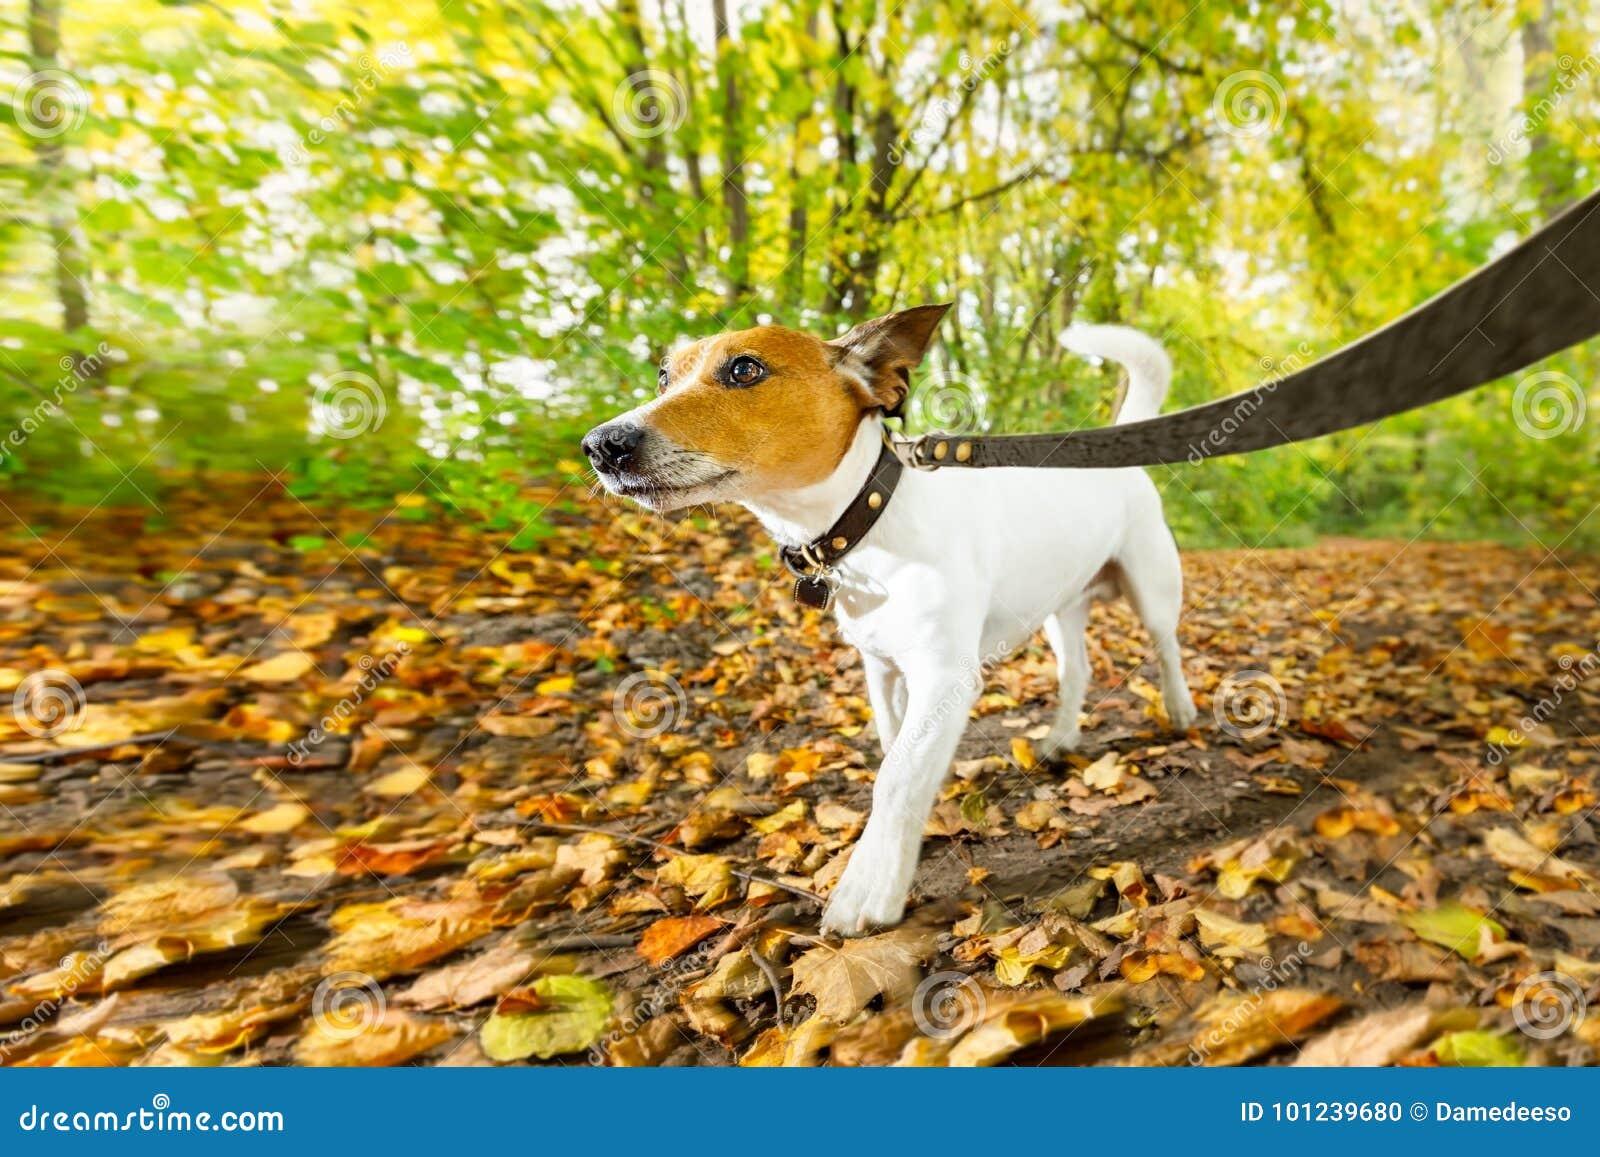 Hundspring eller gå i höst